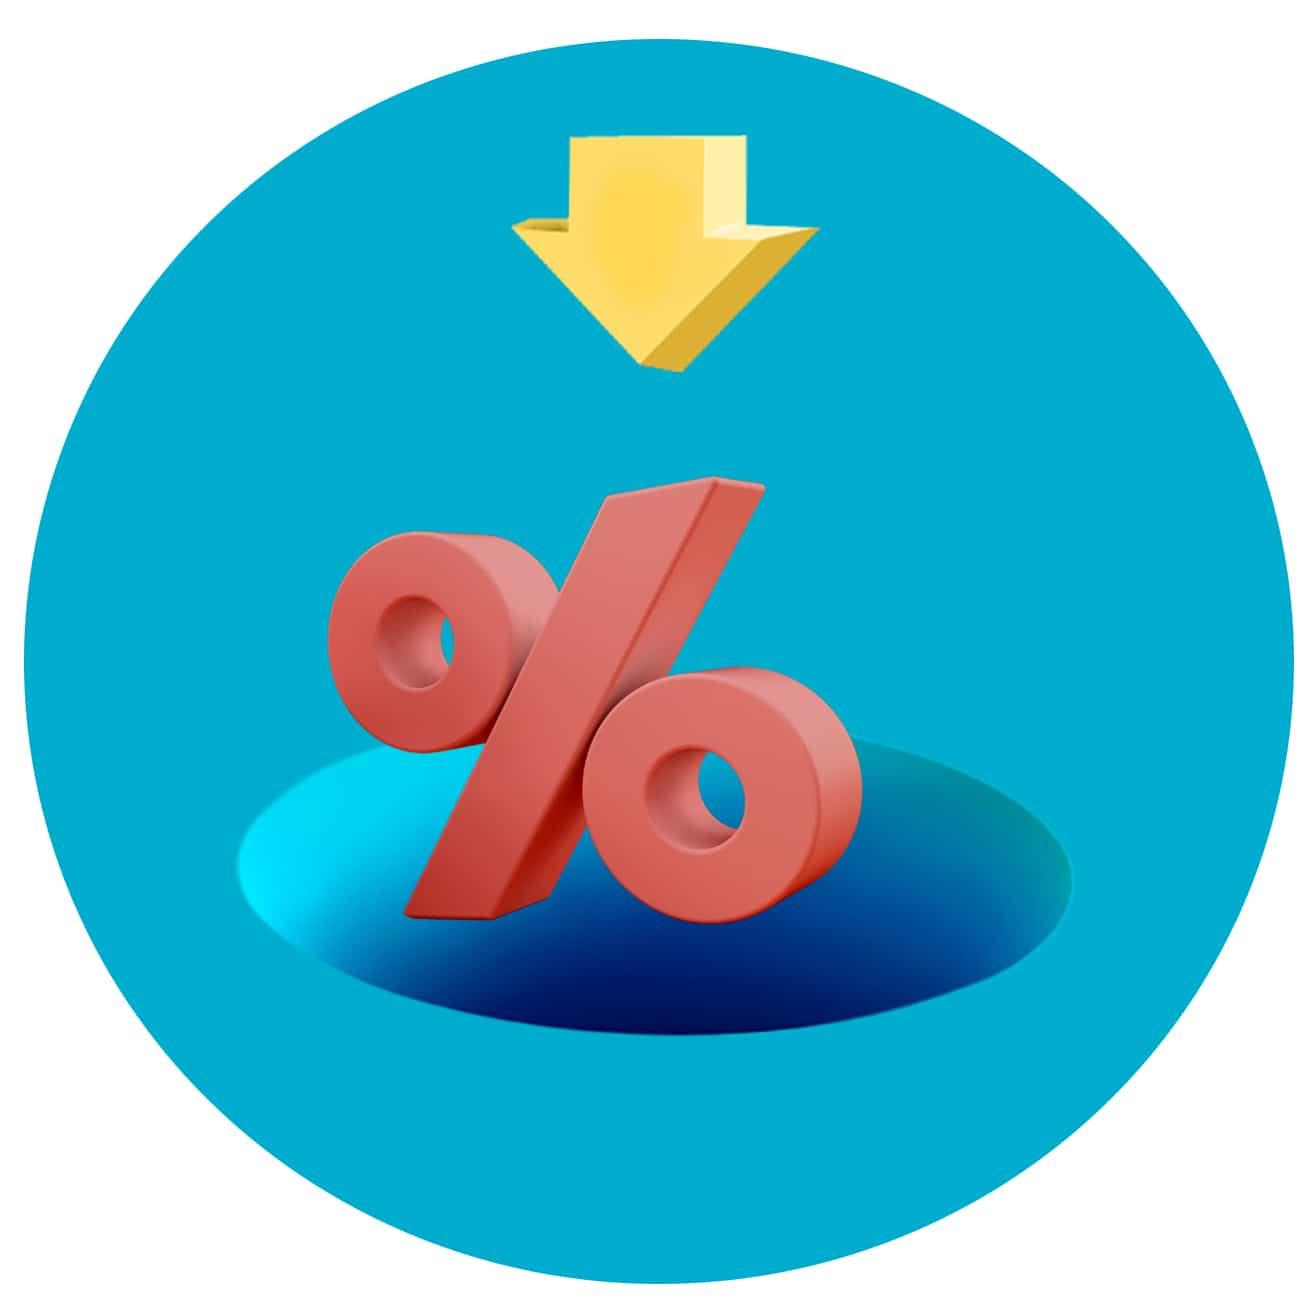 Lawsuit loans with low interest rates